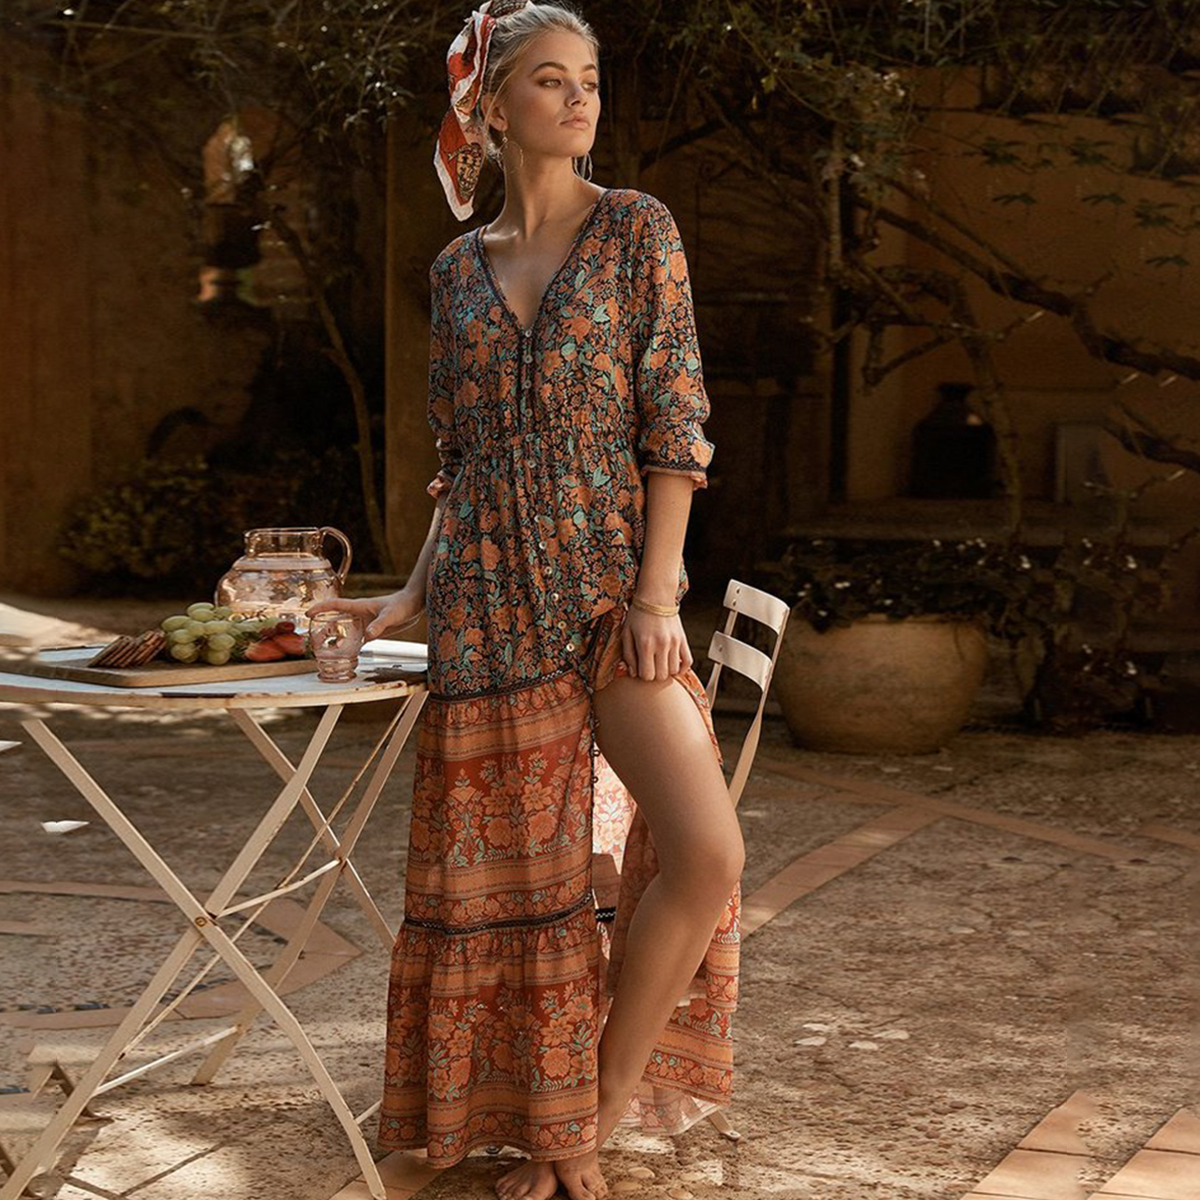 fd4f81cc52 Gypsy Style Floral Print Dress V-Neck Long Sleeve Autumn Dresses 2019  Bohemian Maxi Dress